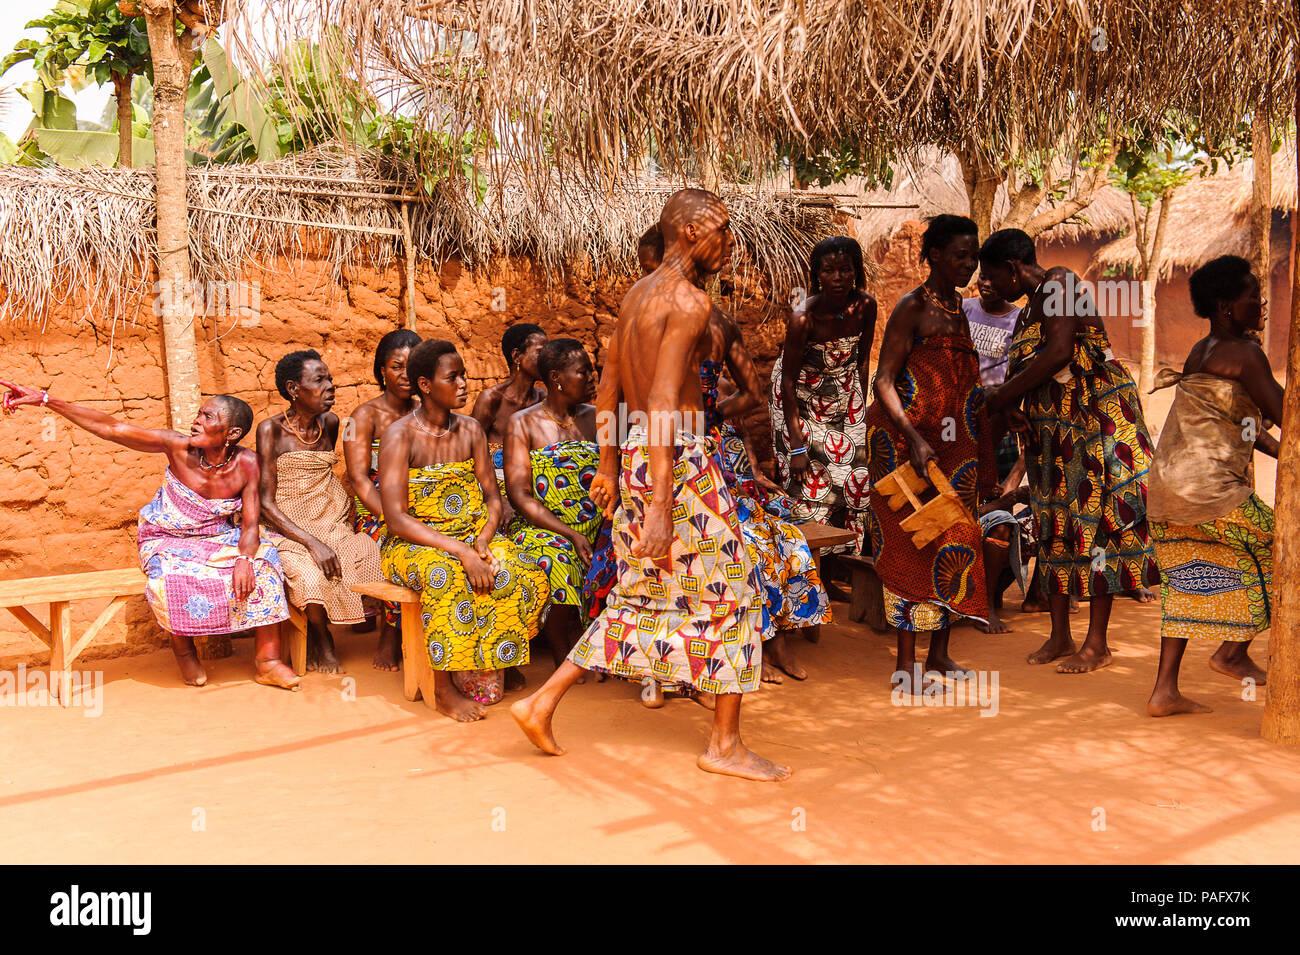 KARA, TOGO - MAR 11, 2012: Unidentified Togolese people